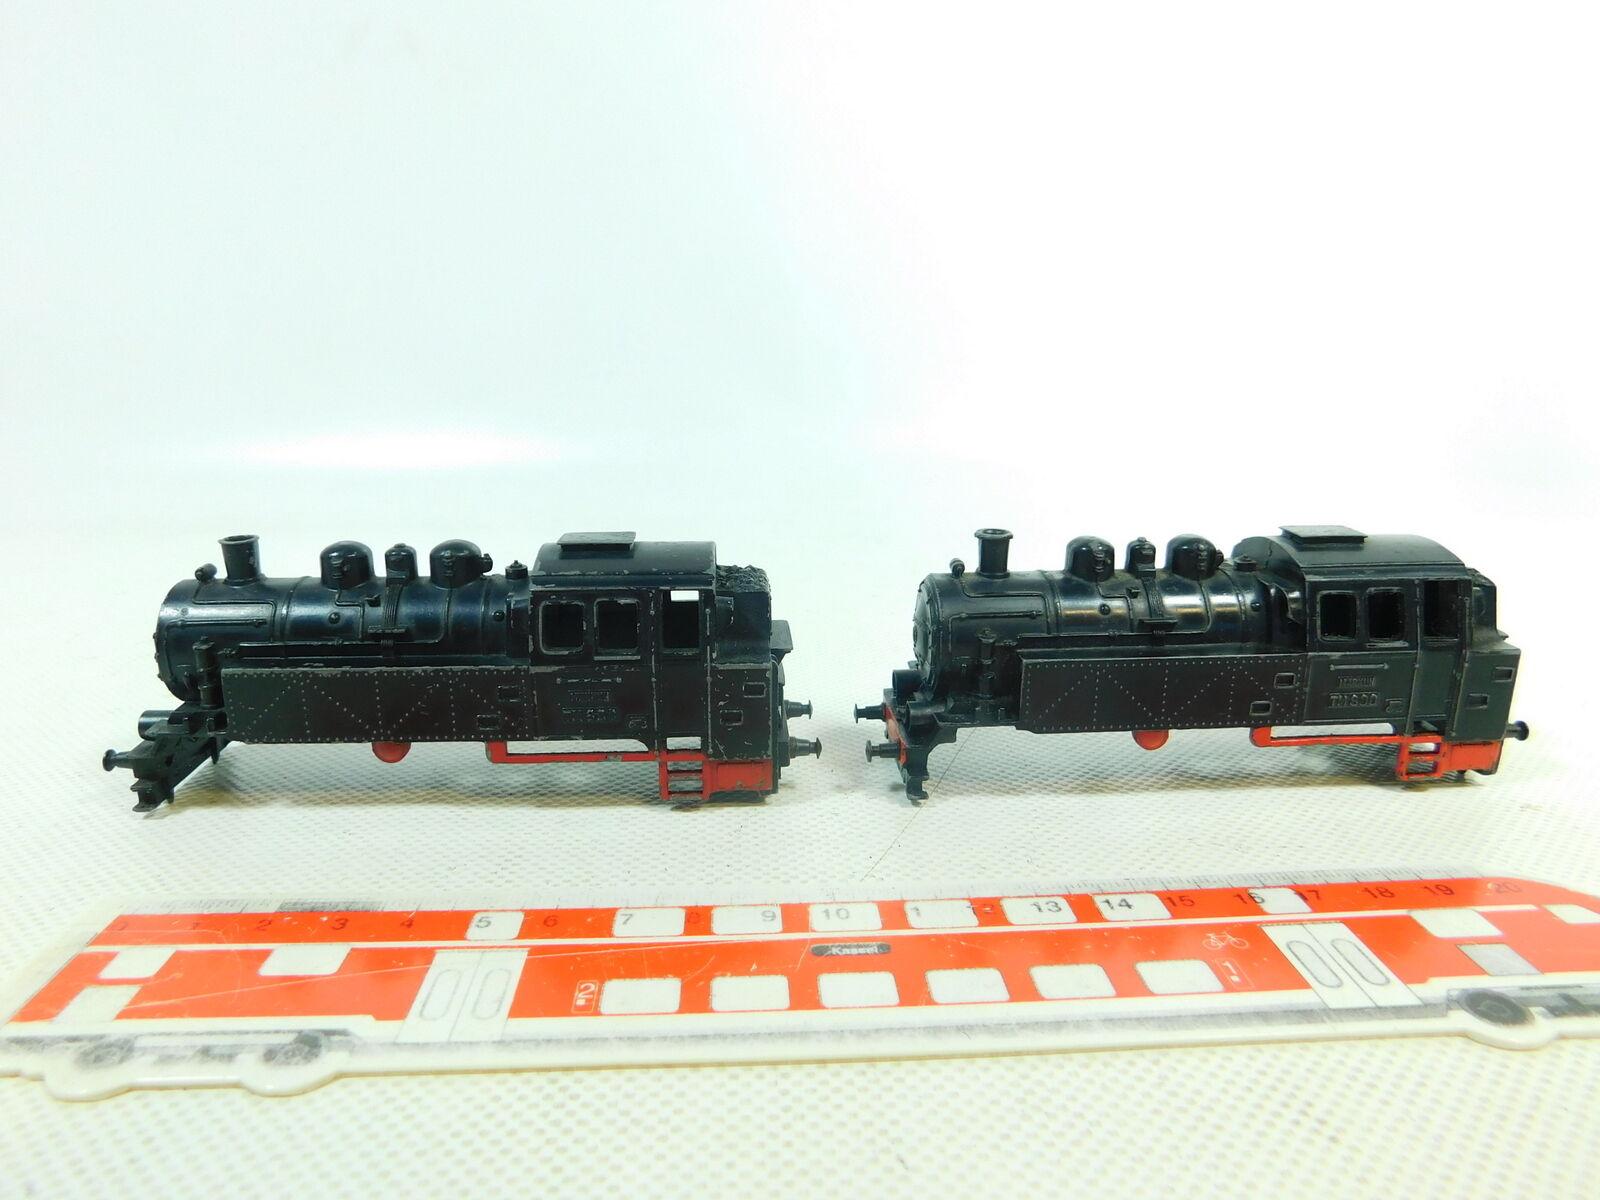 Bt252-1x Märklin h0 Body Cast Iron for TM 800 LOCOMOTIVE TENDER LOCOMOTIVE to